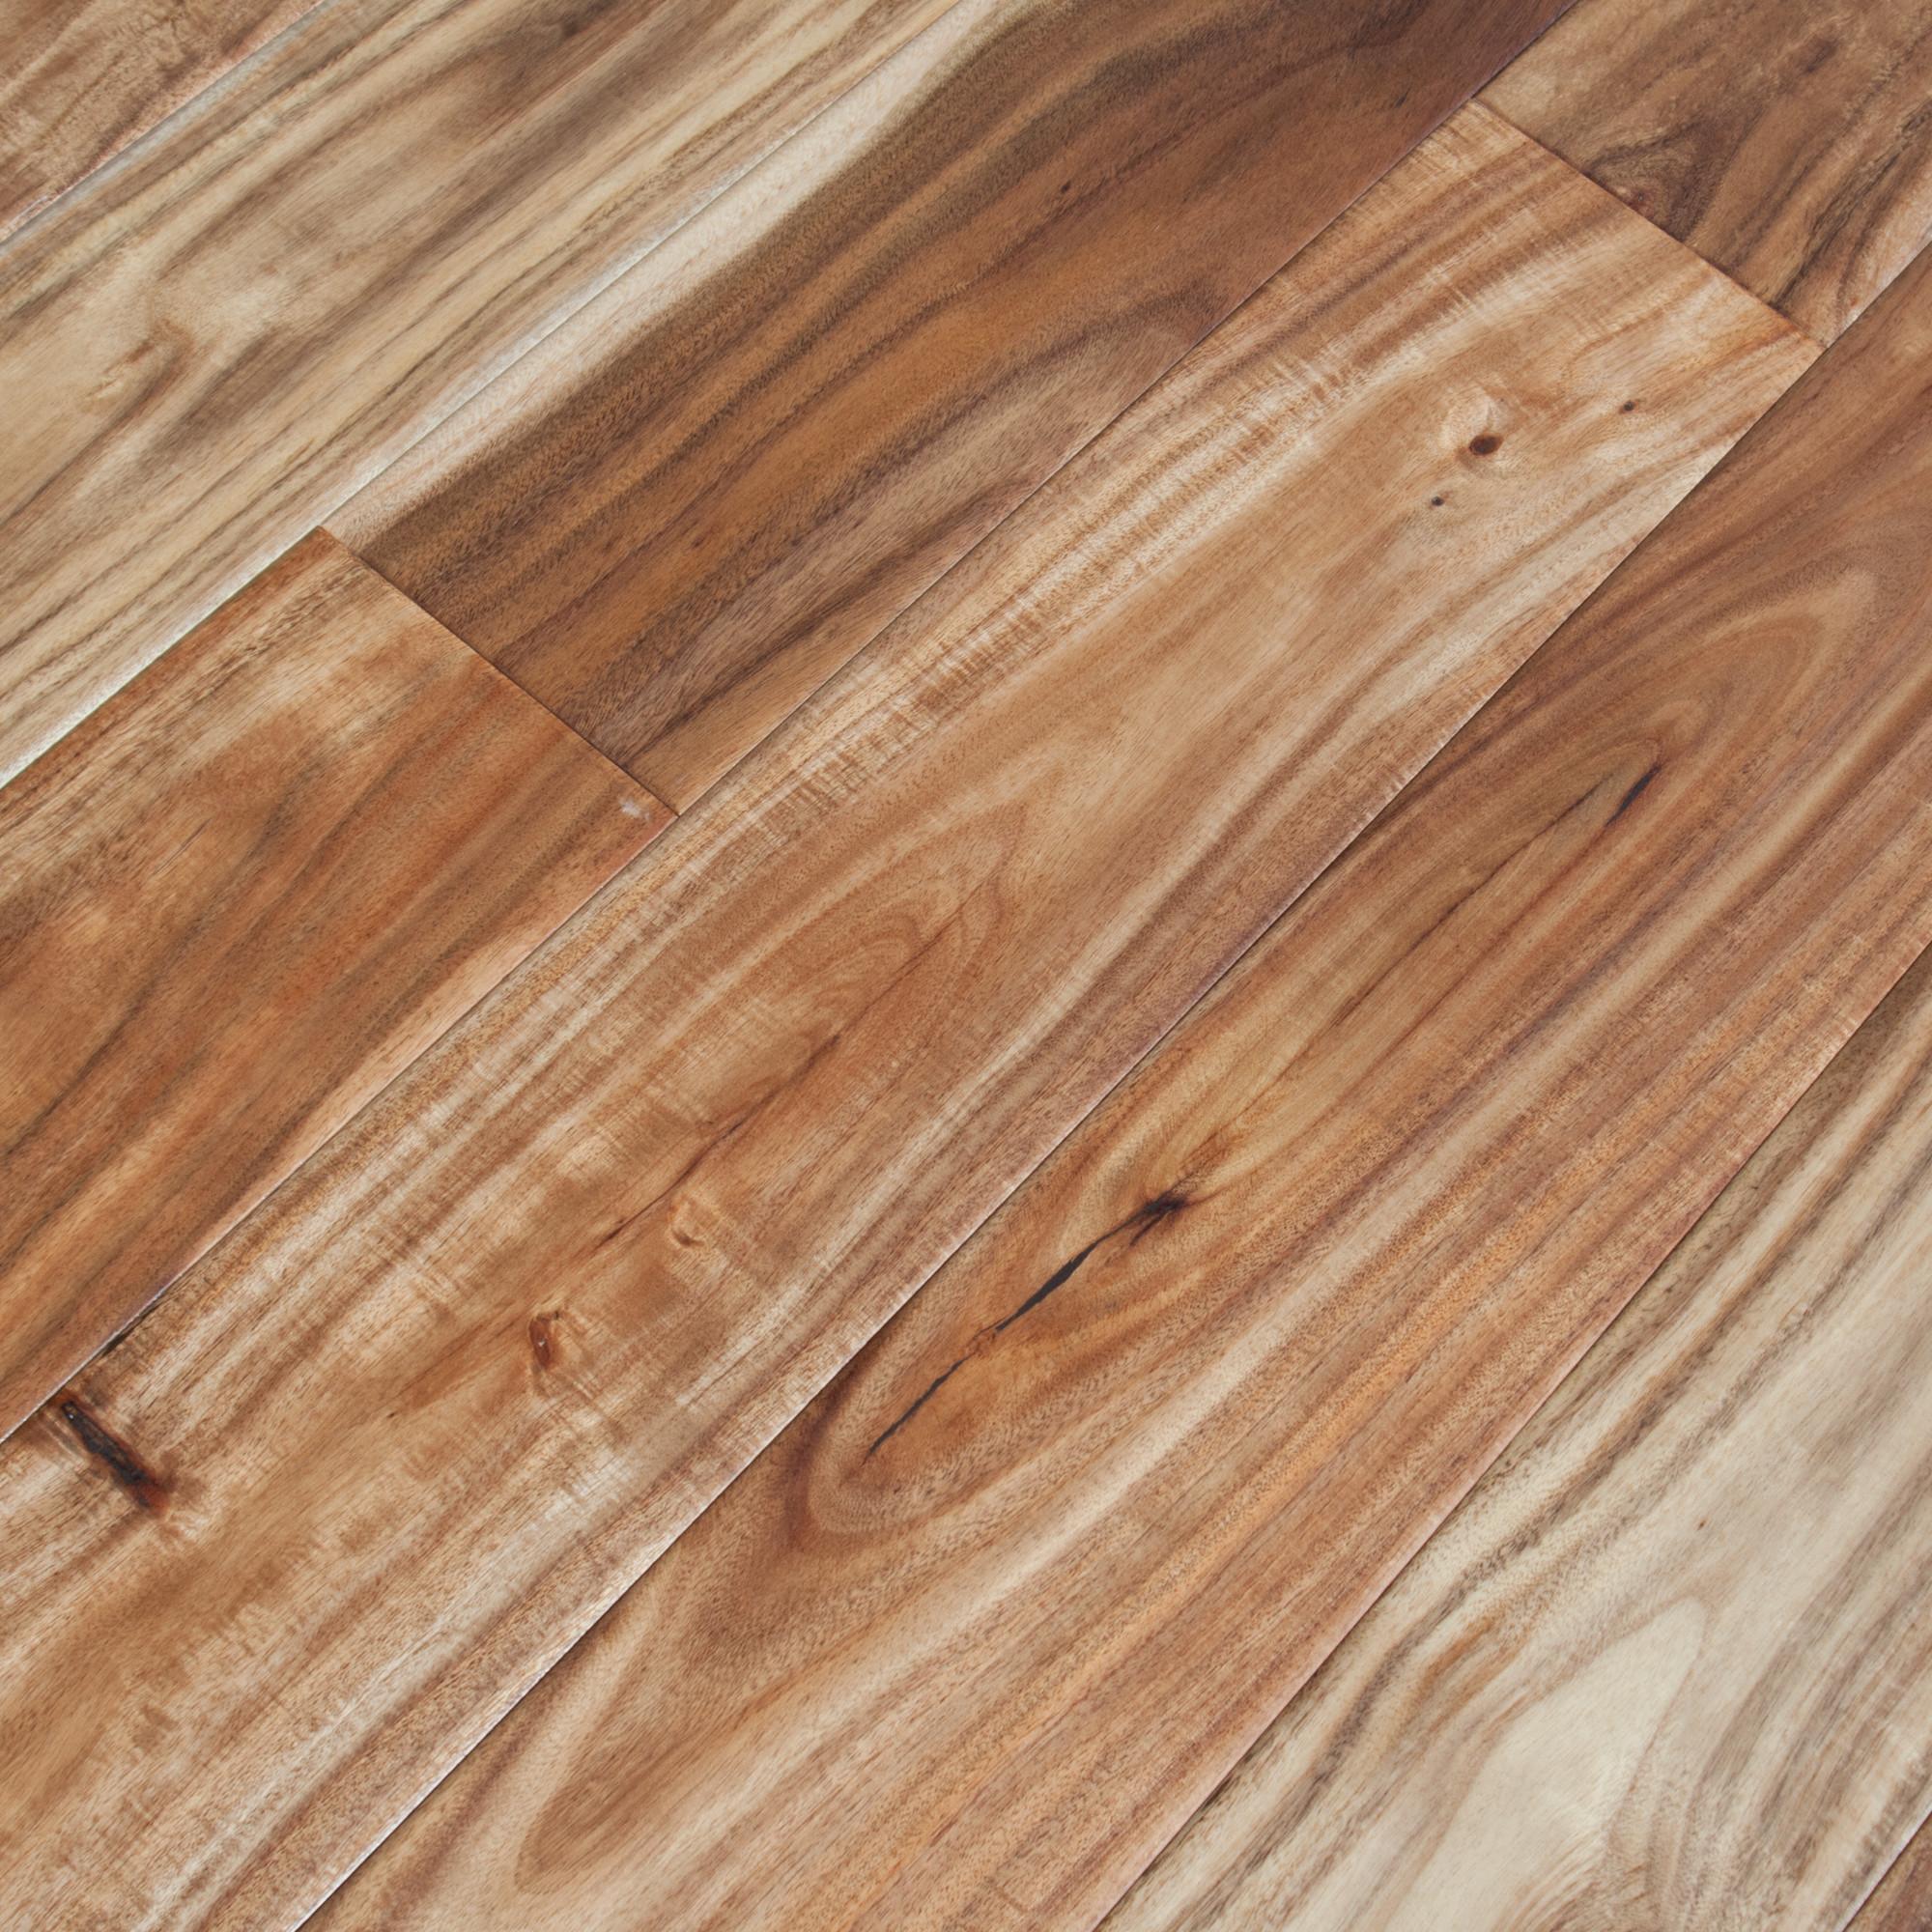 black walnut hardwood flooring prices of 9 mile creek acacia hand scraped acacia confusa wood floors for acacia handscraped natural hardwood flooring